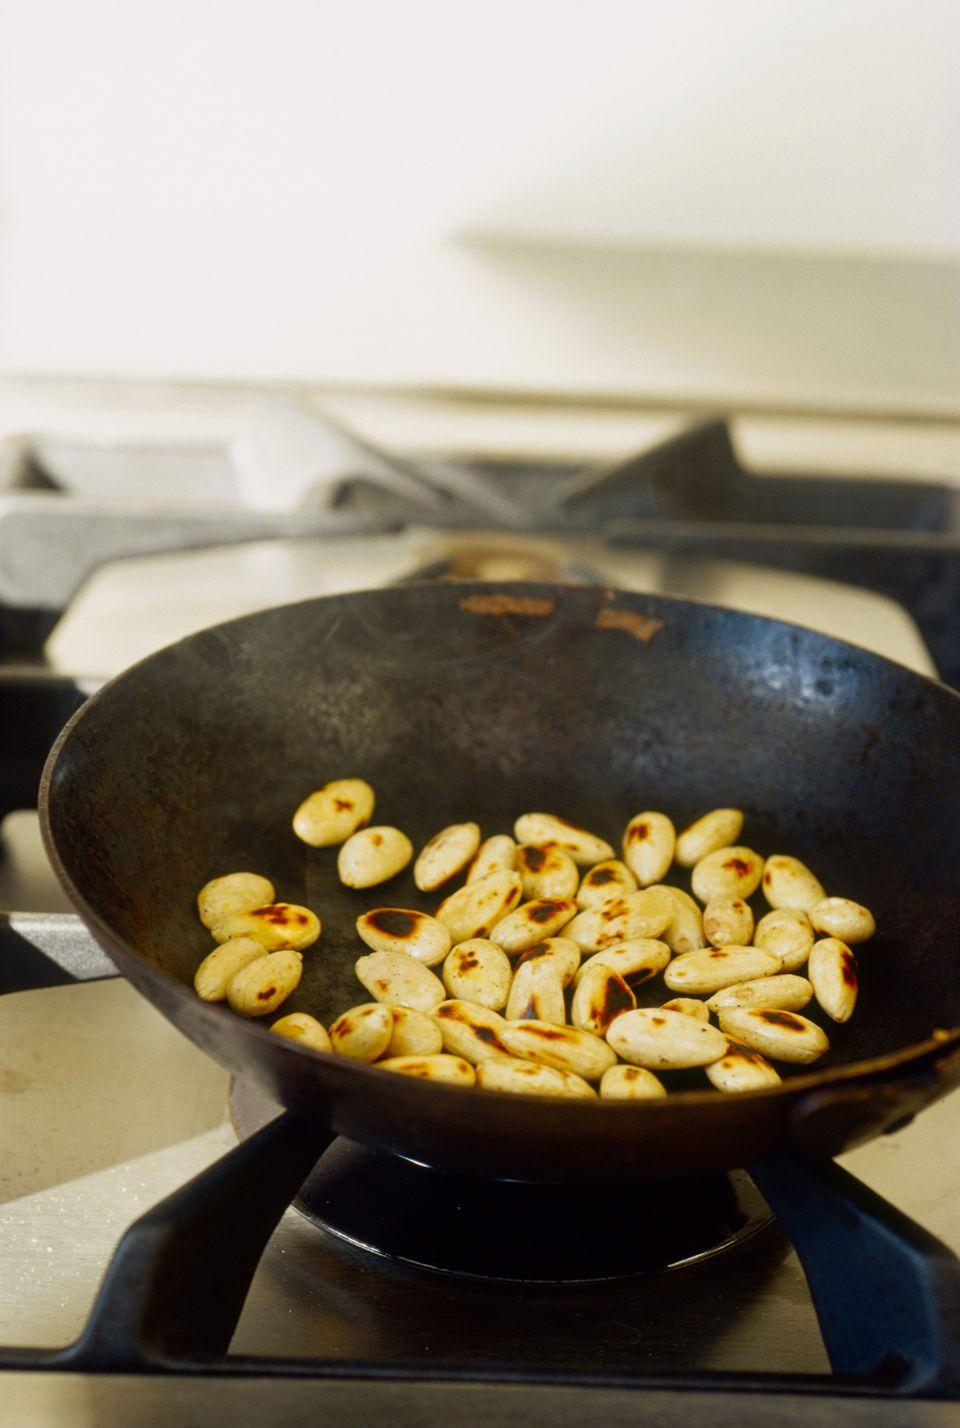 Pan fried almonds